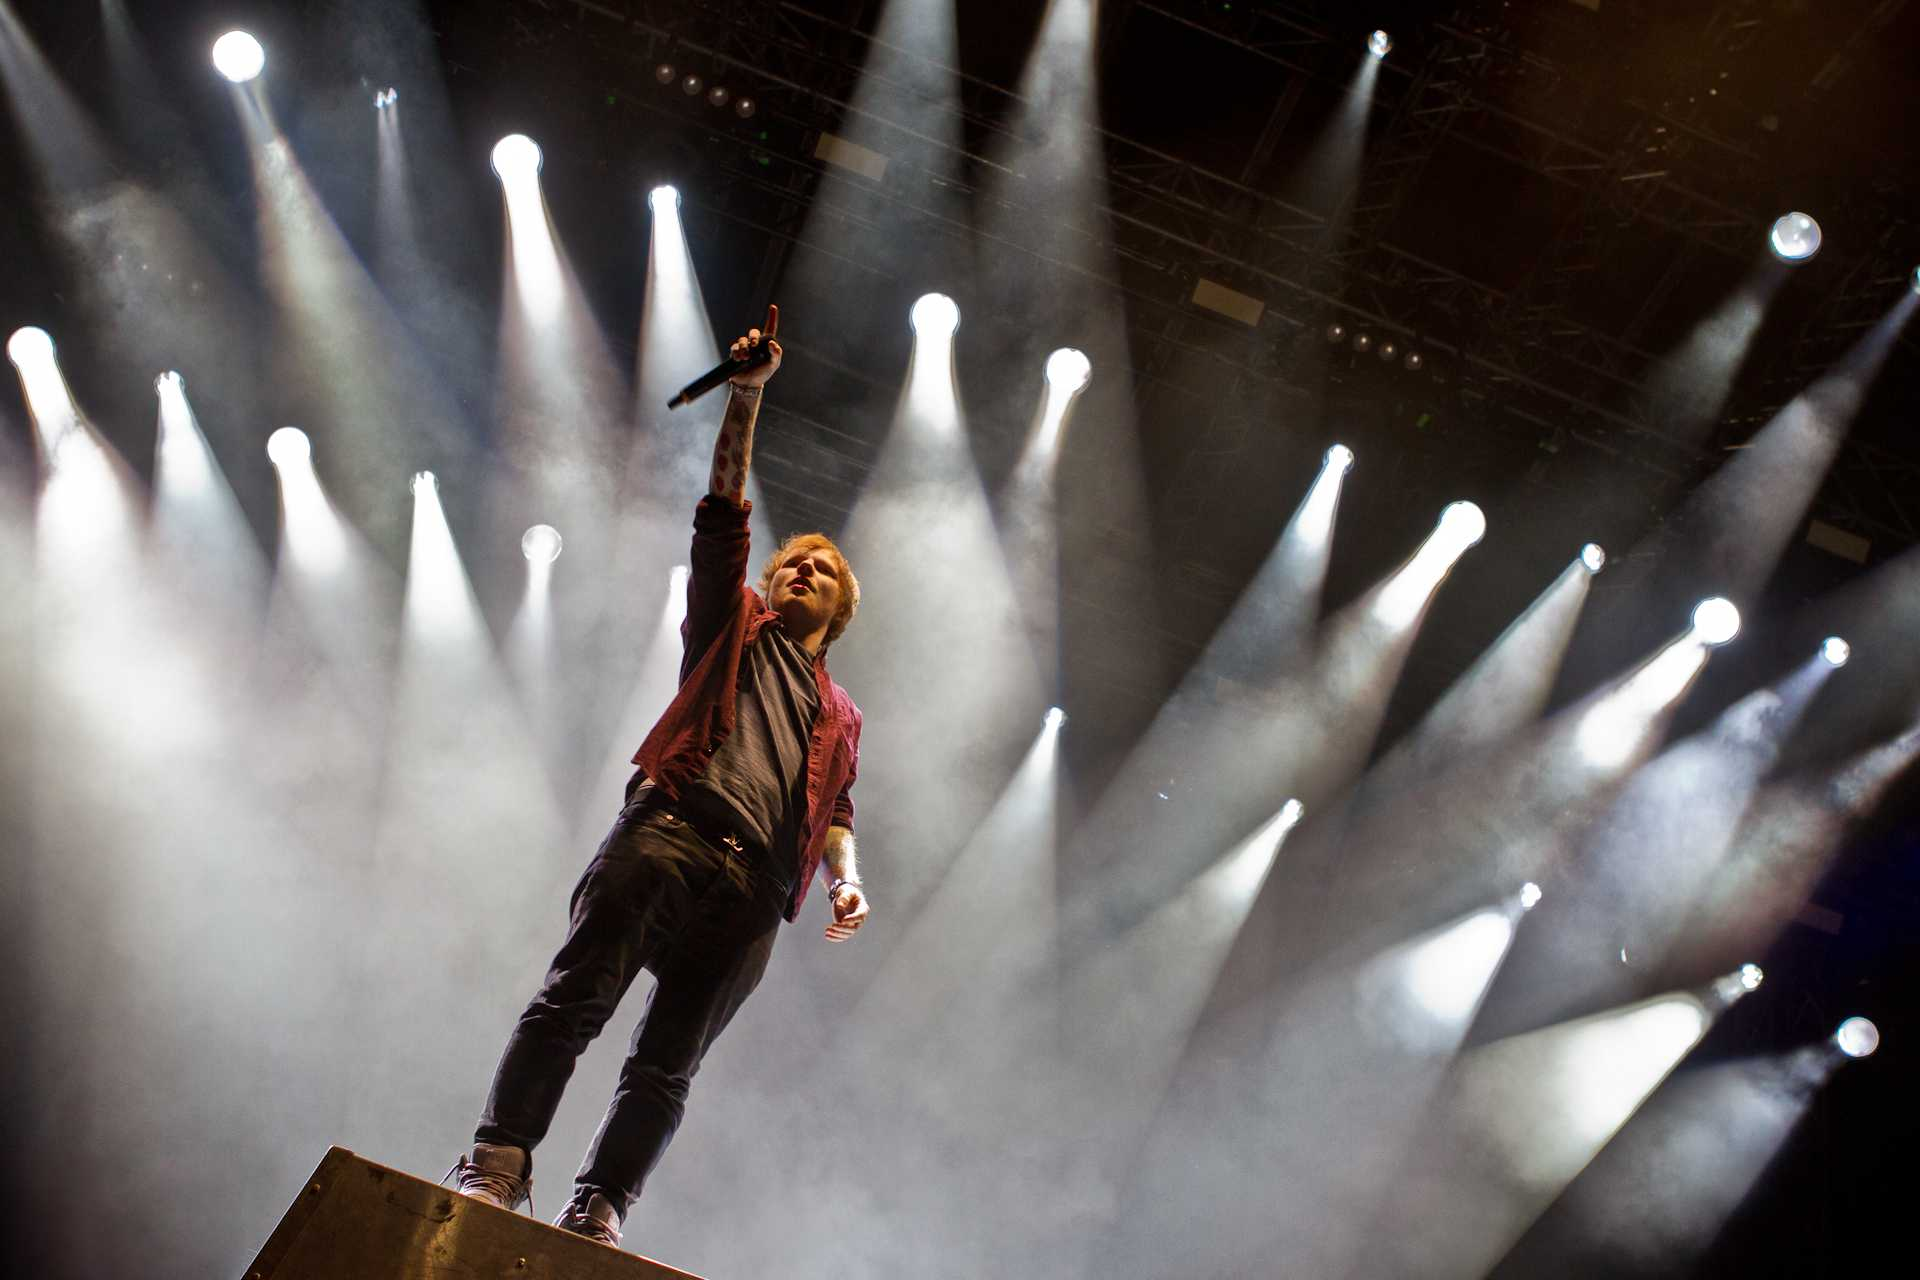 Opinion: Ed Sheeran's Third Album